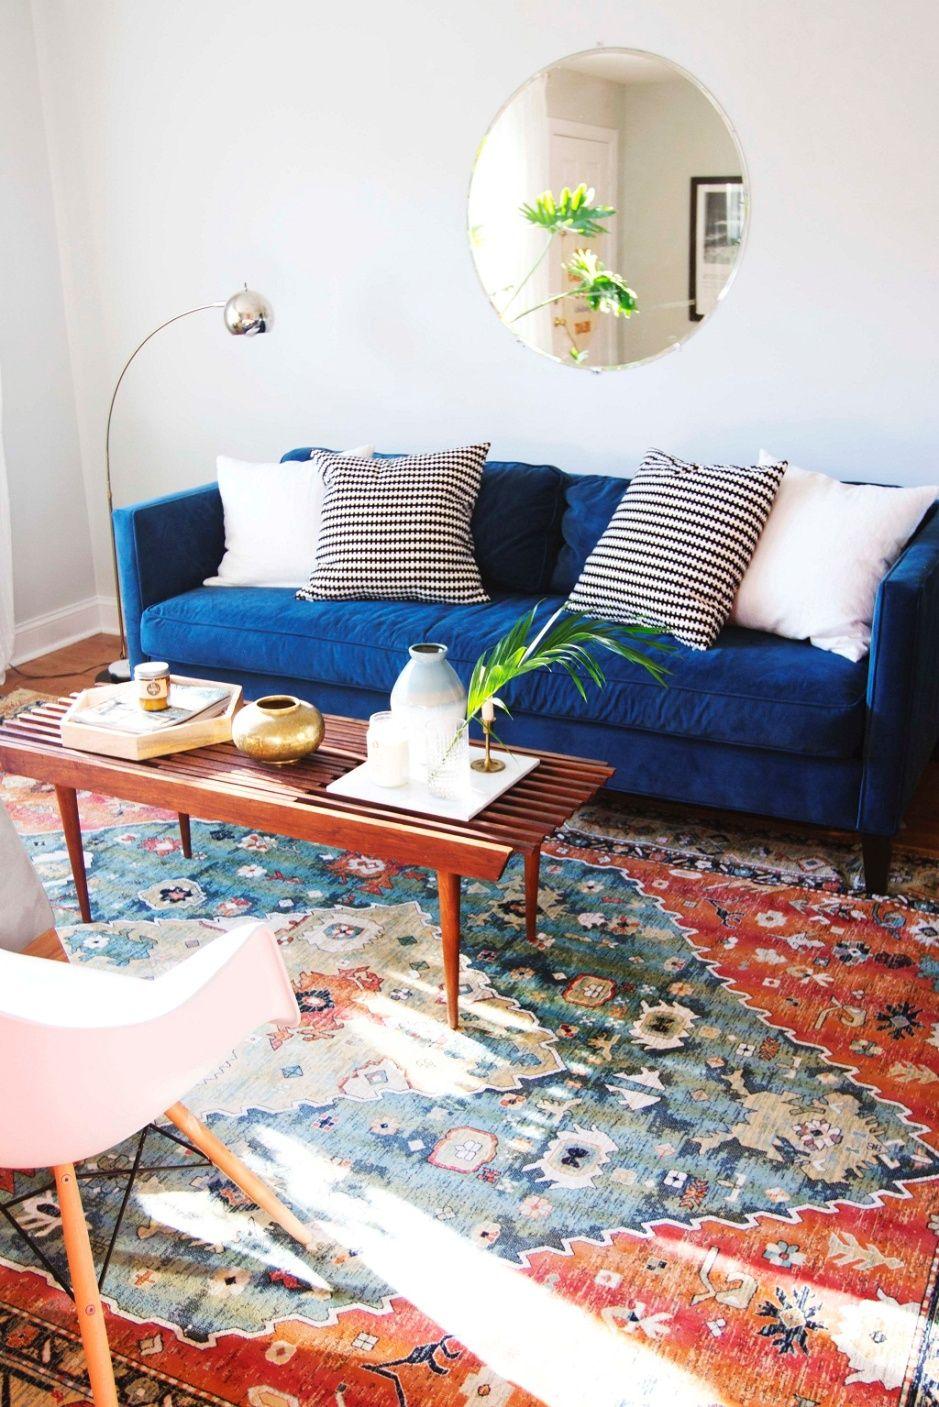 Net Sang Trọng Kho Cưỡng Với Ghế Sofa Nỉ Mau Xanh Living Room Area Rugs Couches Living Room Room Decor